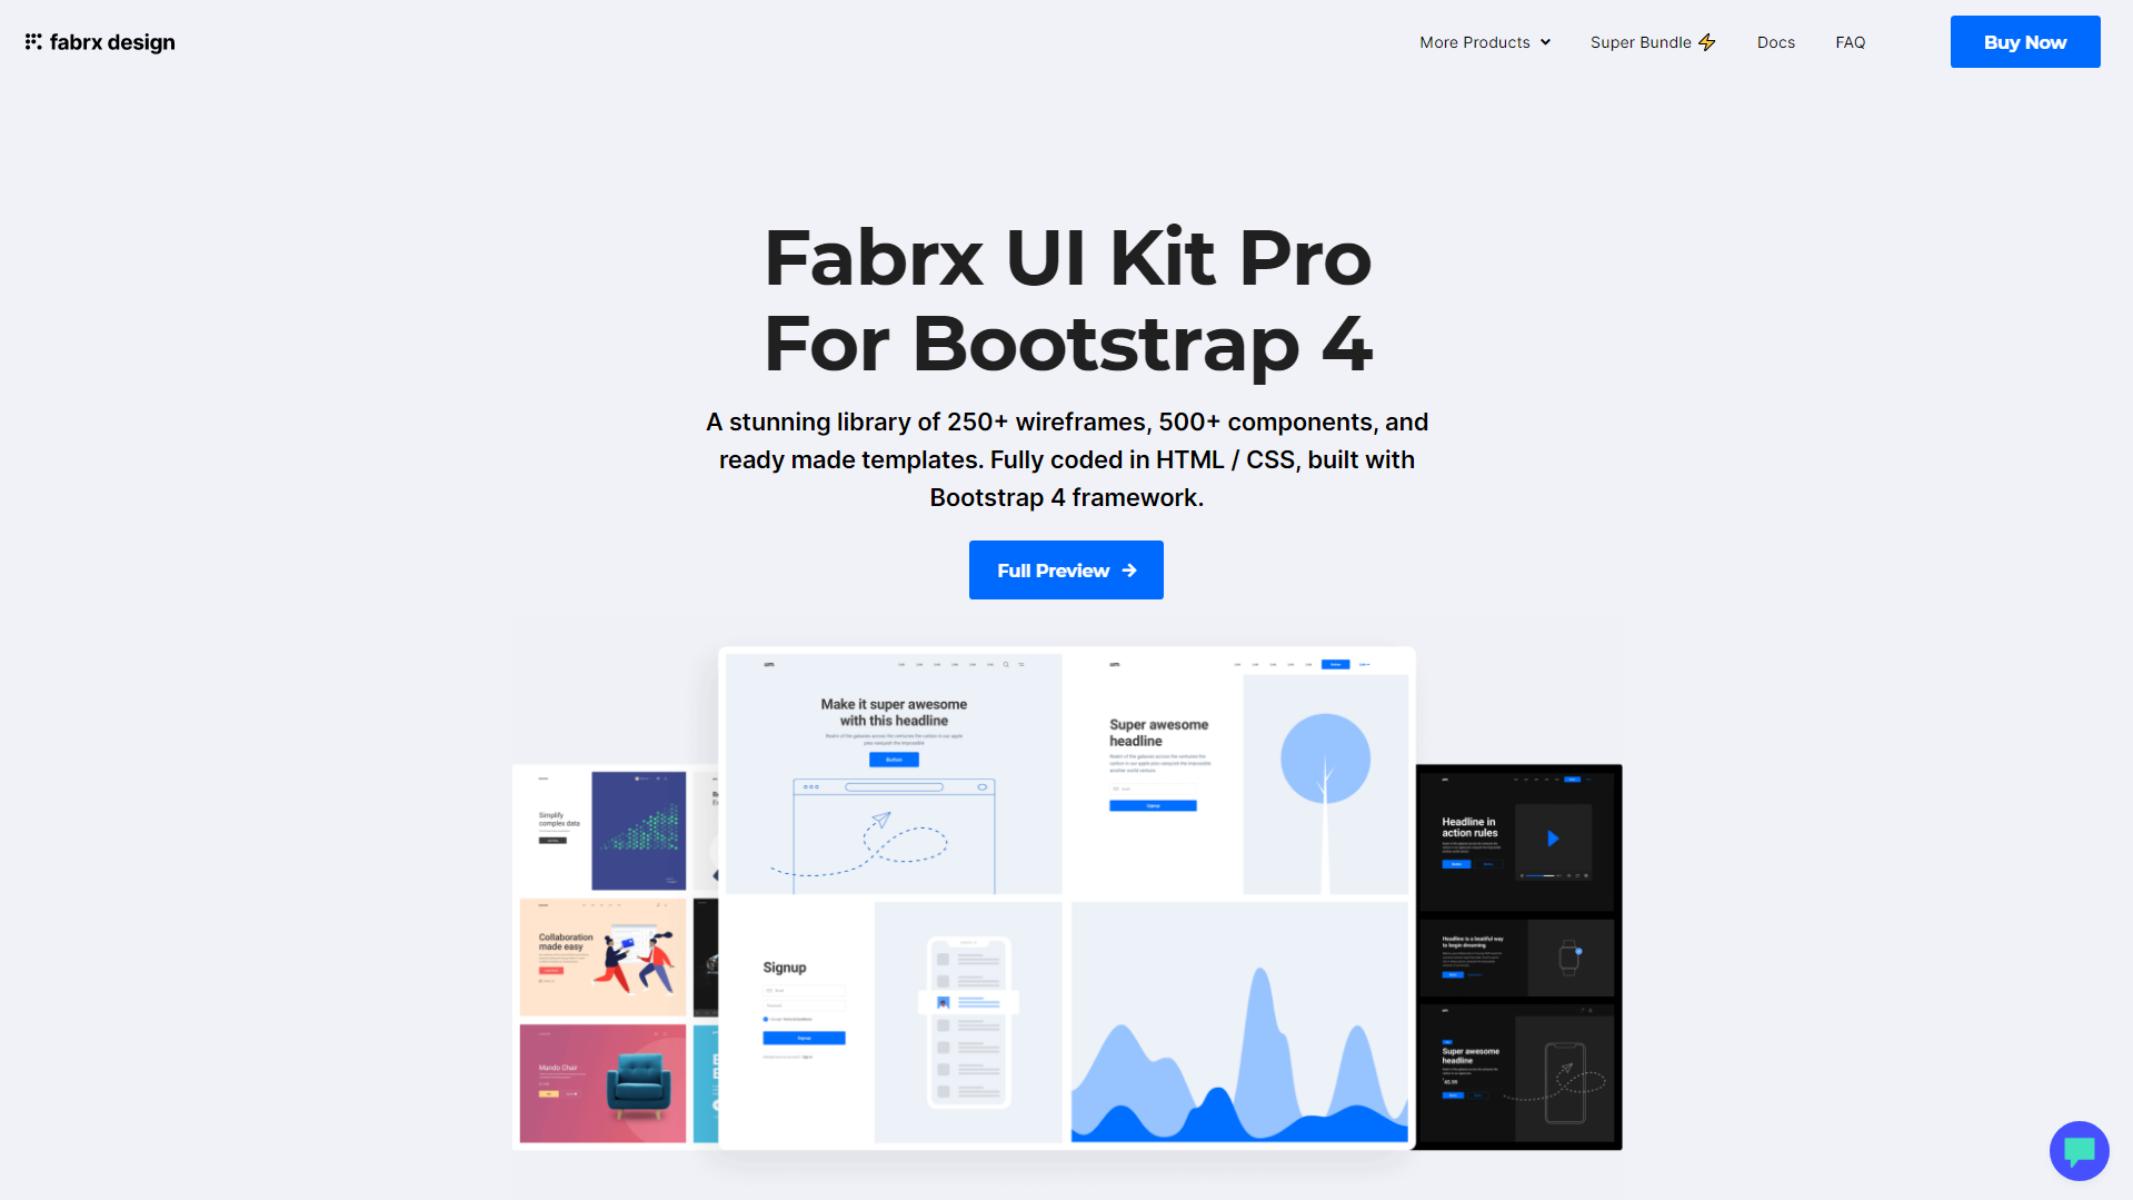 Fabrx UI kit